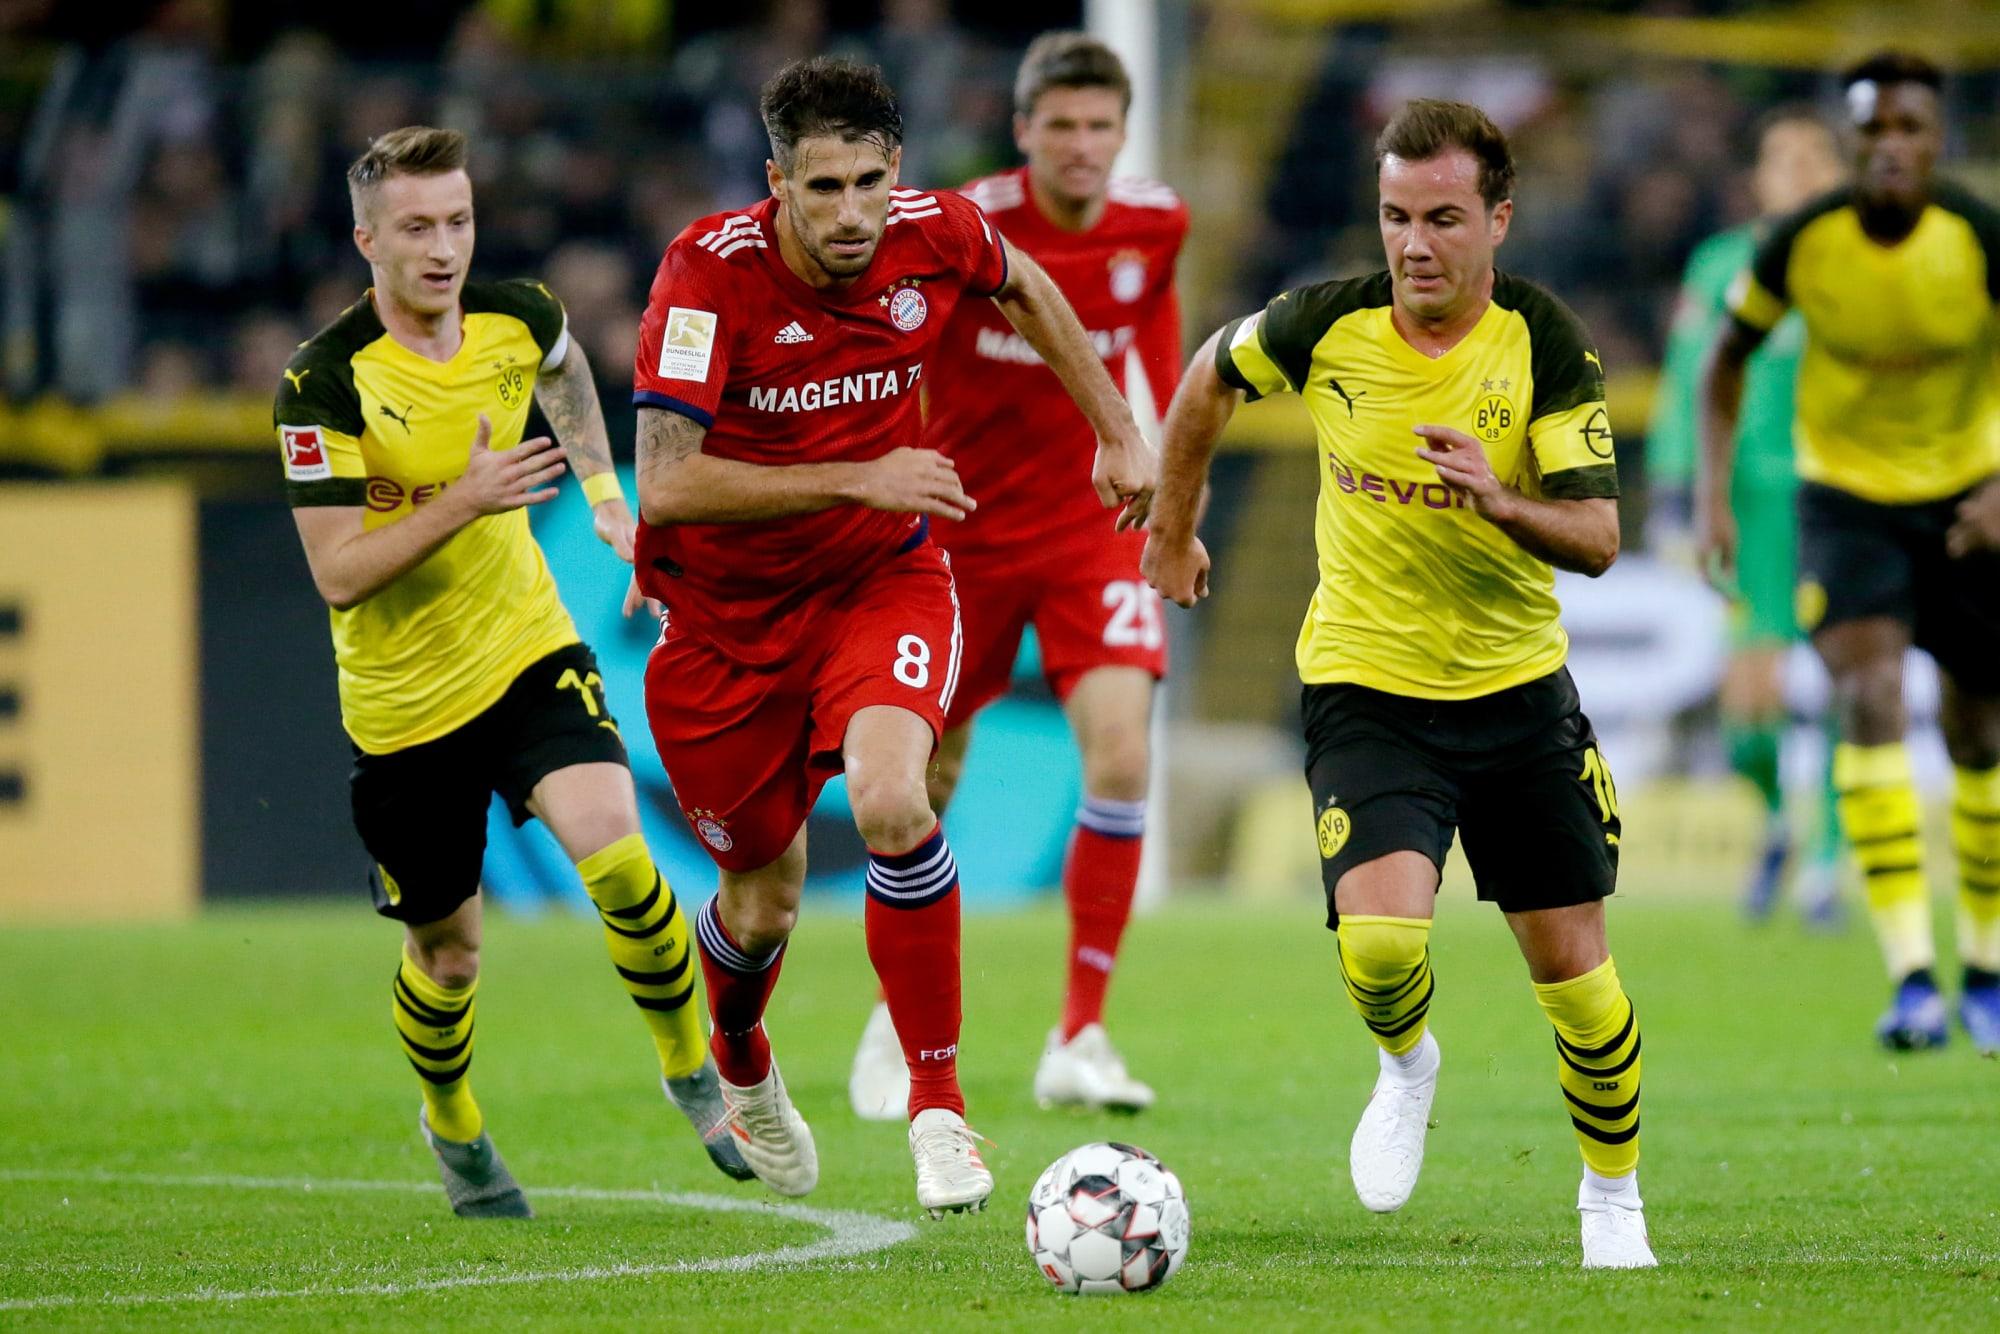 How to watch Bayern Munich vs Borussia Dortmund: Live Stream, TV Channel for Bundesliga match